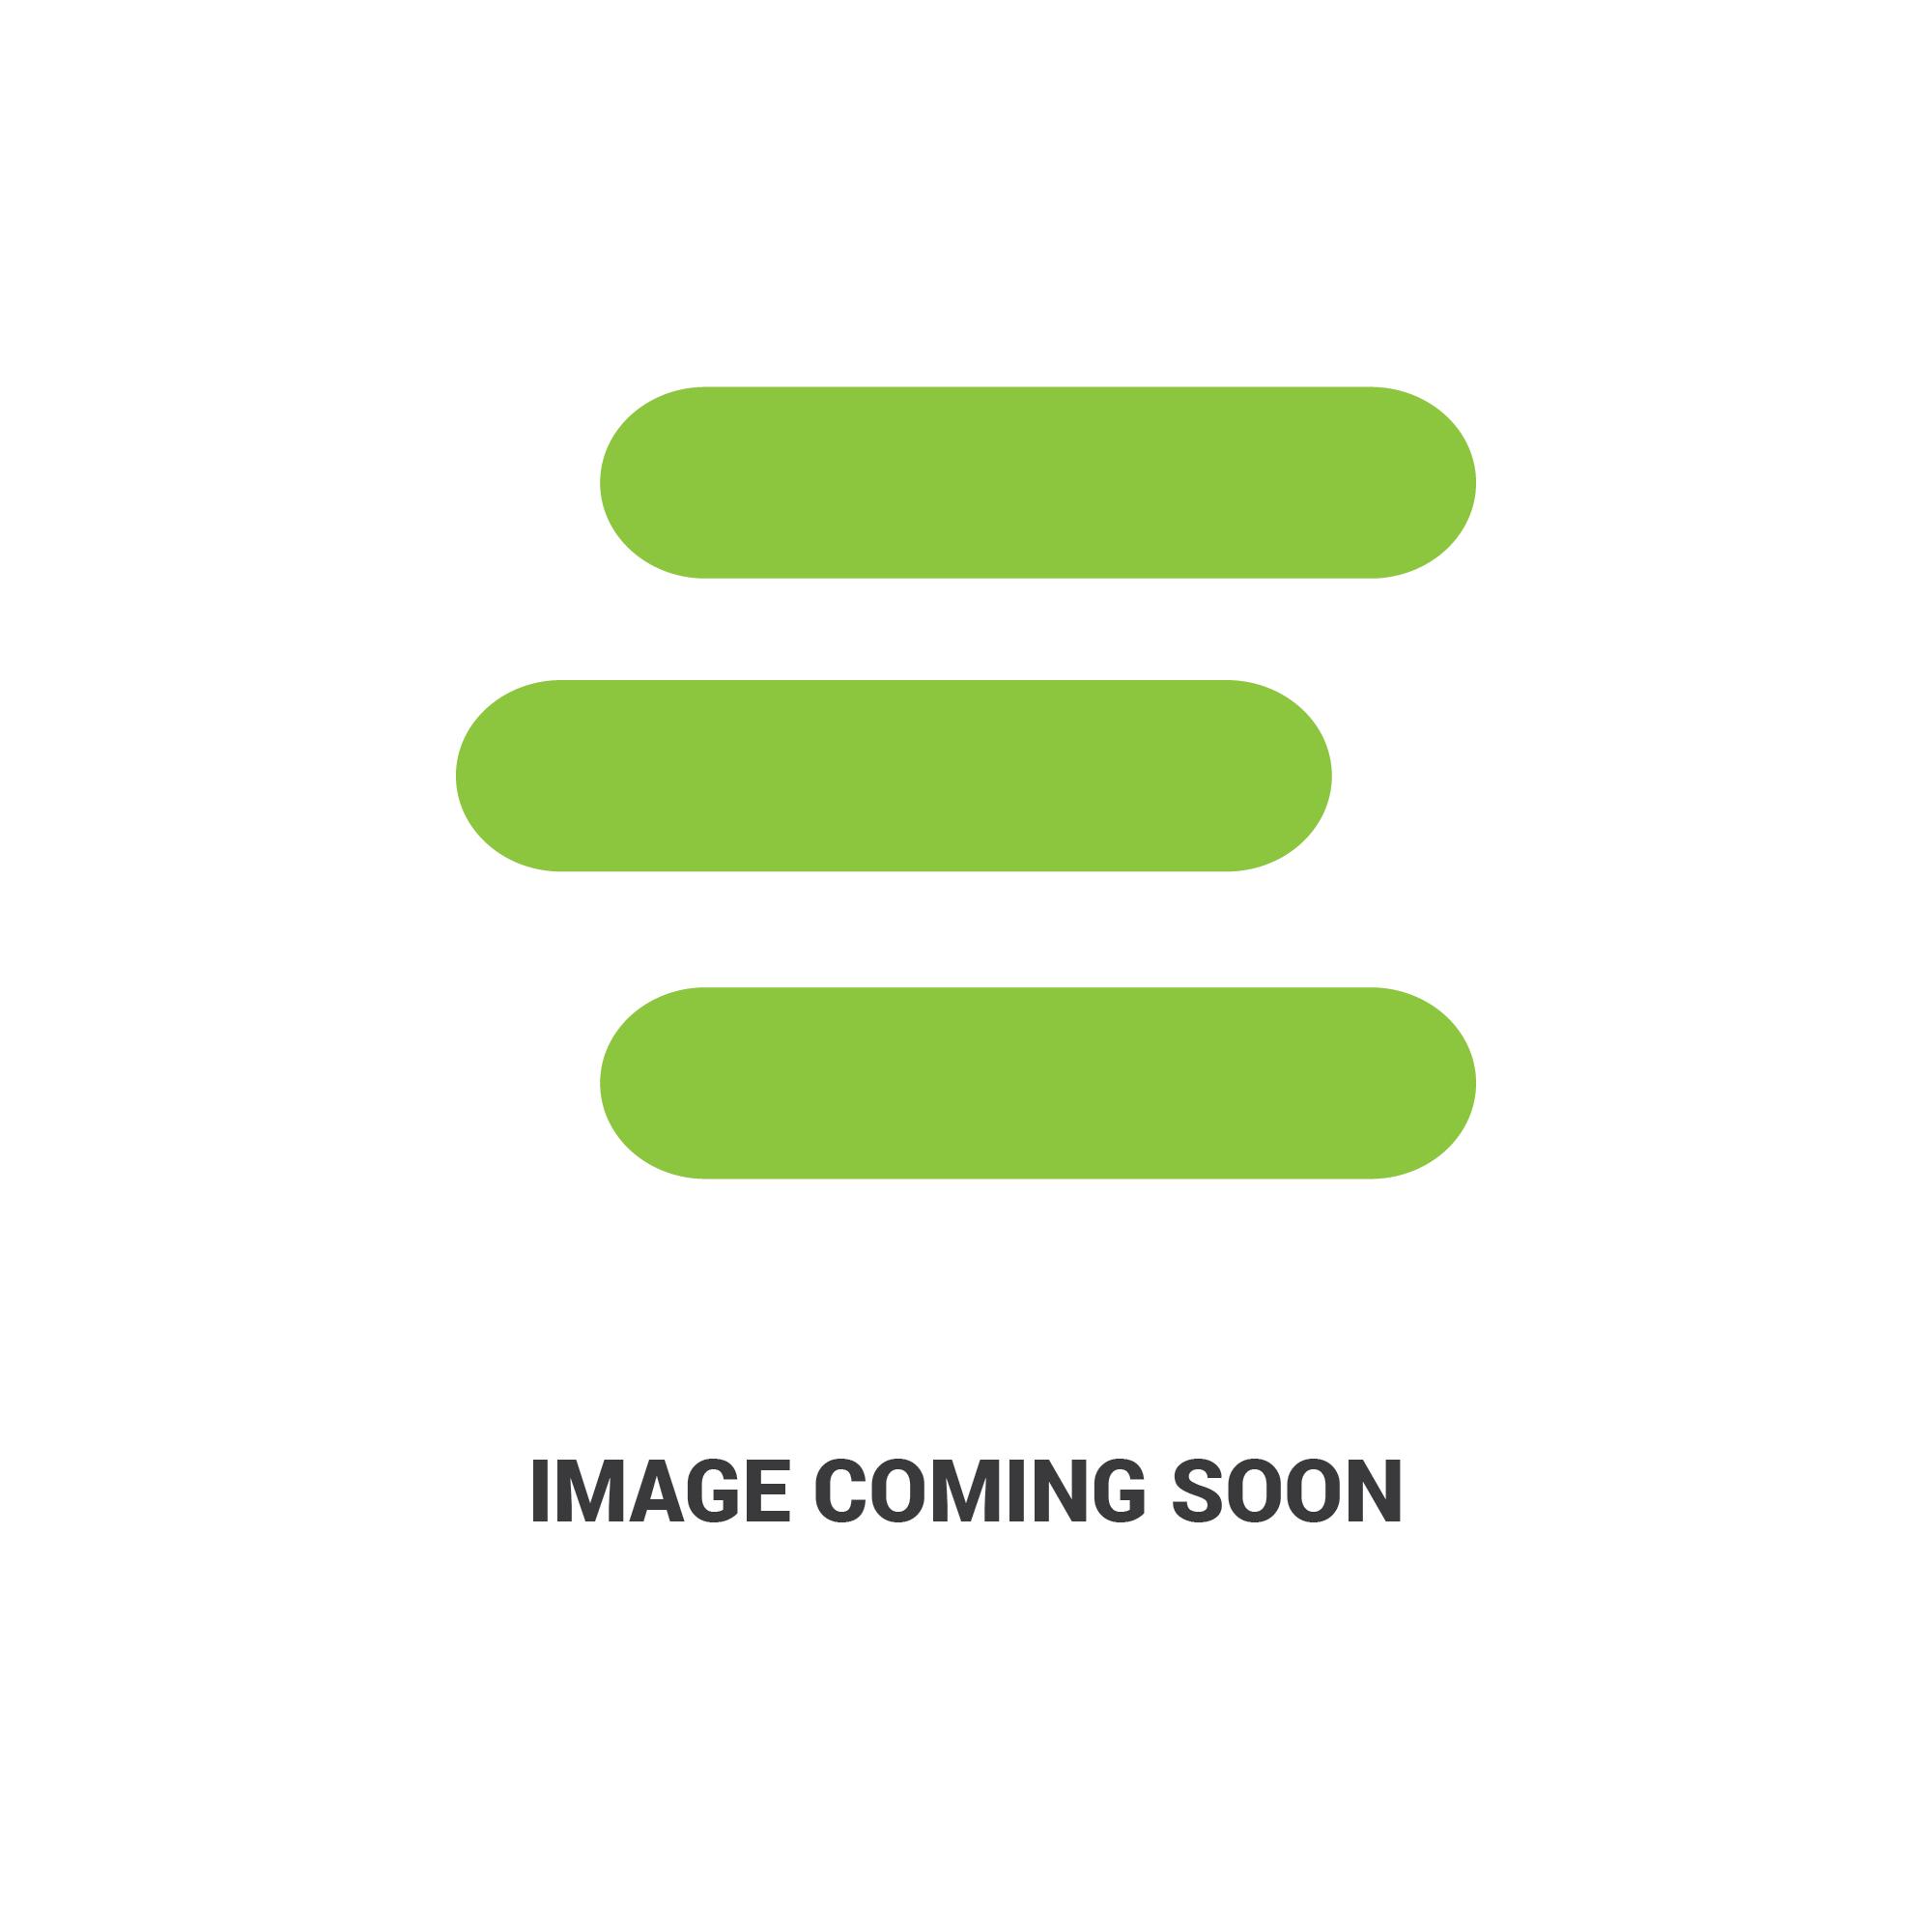 E-1968468C11531_1.jpg